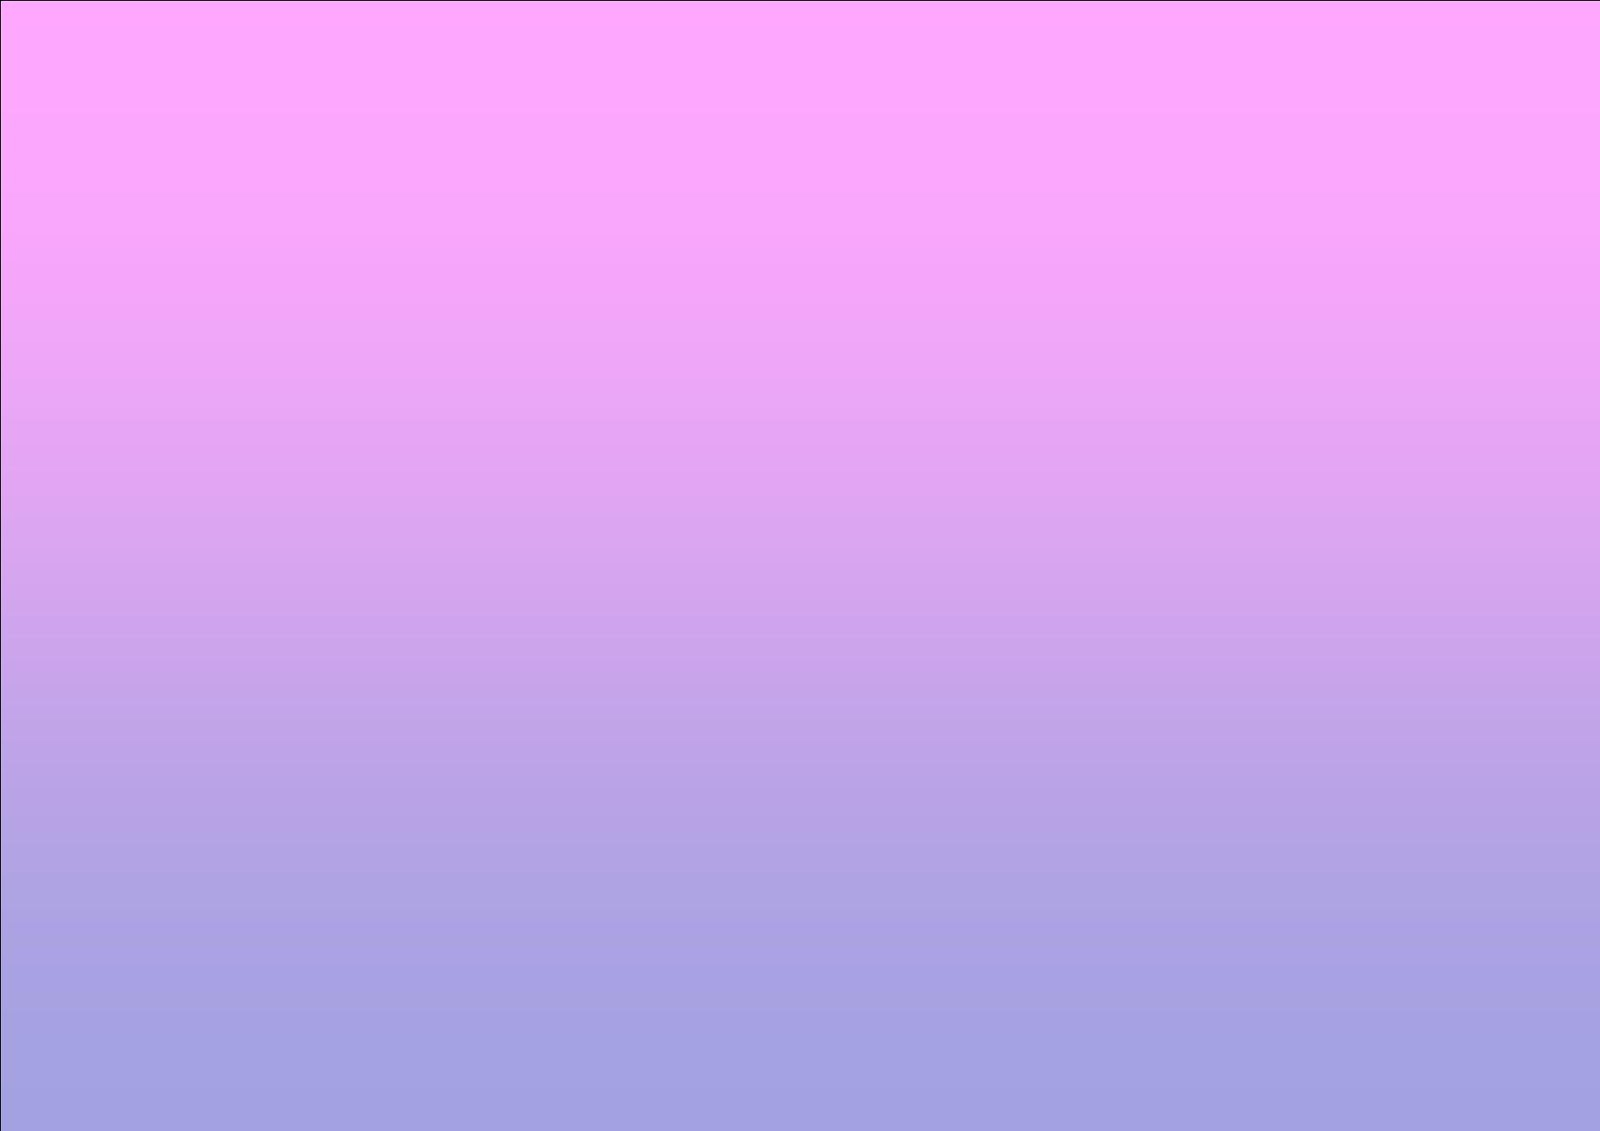 Pink Animal Print Wallpaper Fondos Degradee De Colores Pasteles